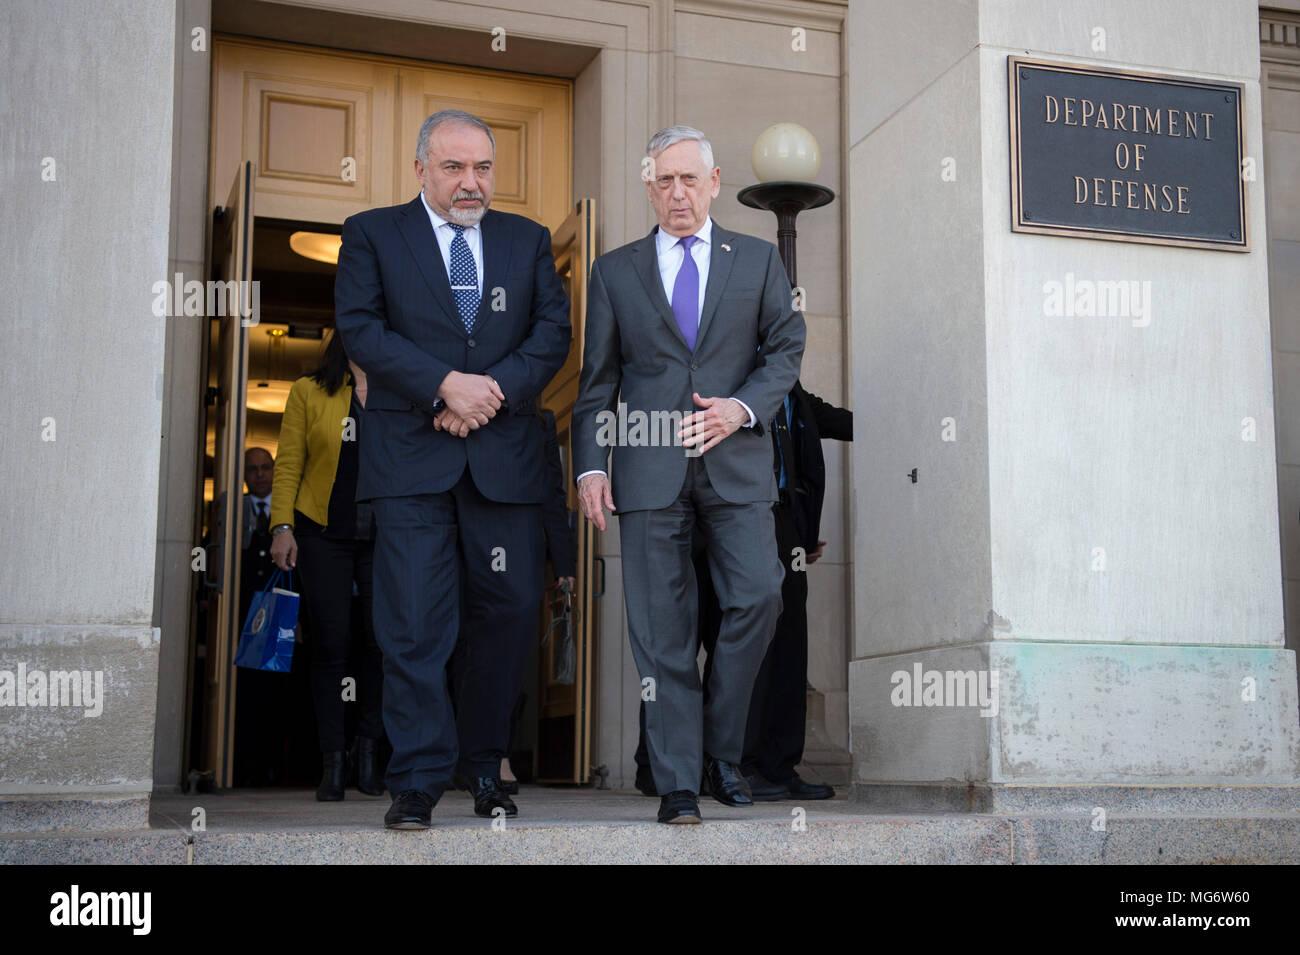 U.S. Secretary of Defense Jim Mattis escorts Israeli Defense Minister Avigdor Lieberman, left, to his vehicle following their bilateral meeting at the Pentagon April 26, 2018 in Arlington, Virginia. - Stock Image